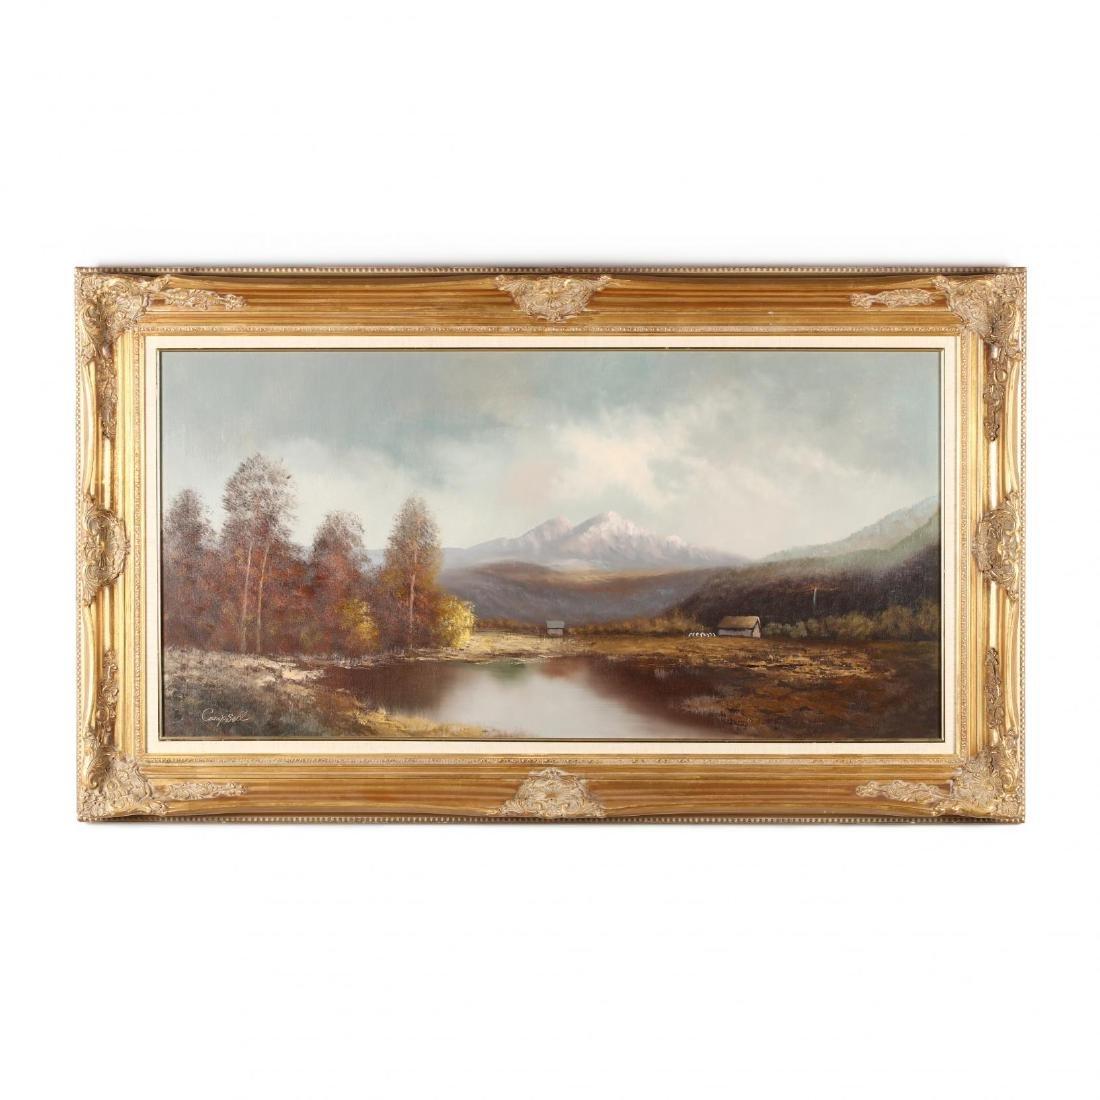 A Contemporary Decorative Landscape Painting